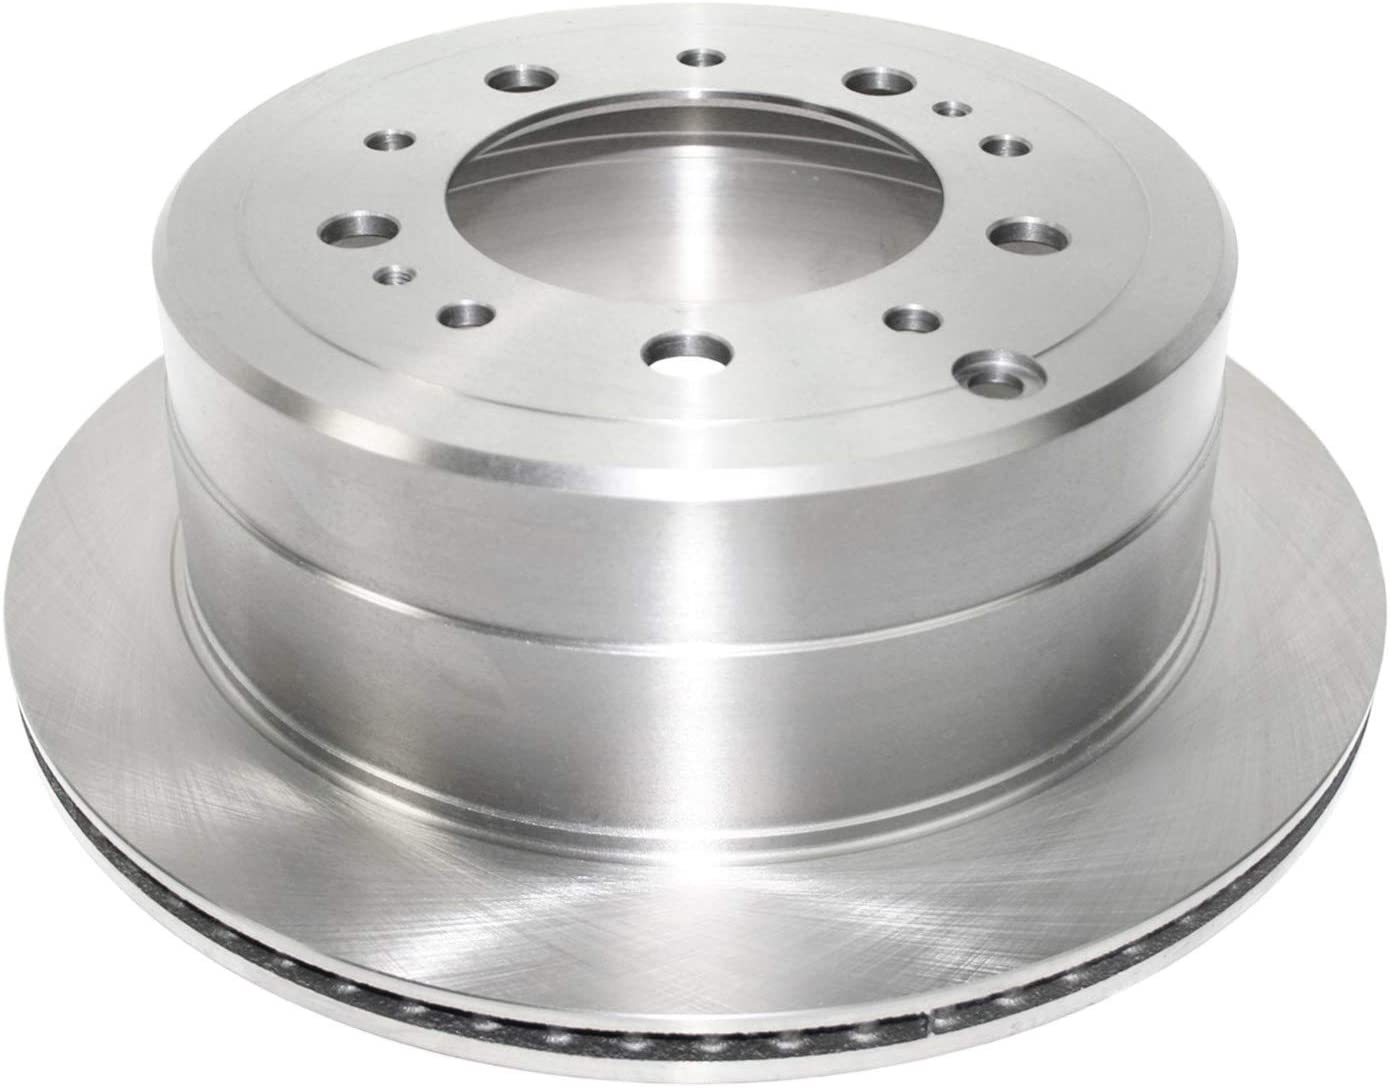 DuraGo BR5556 Rear Vented Disc Brake Rotor